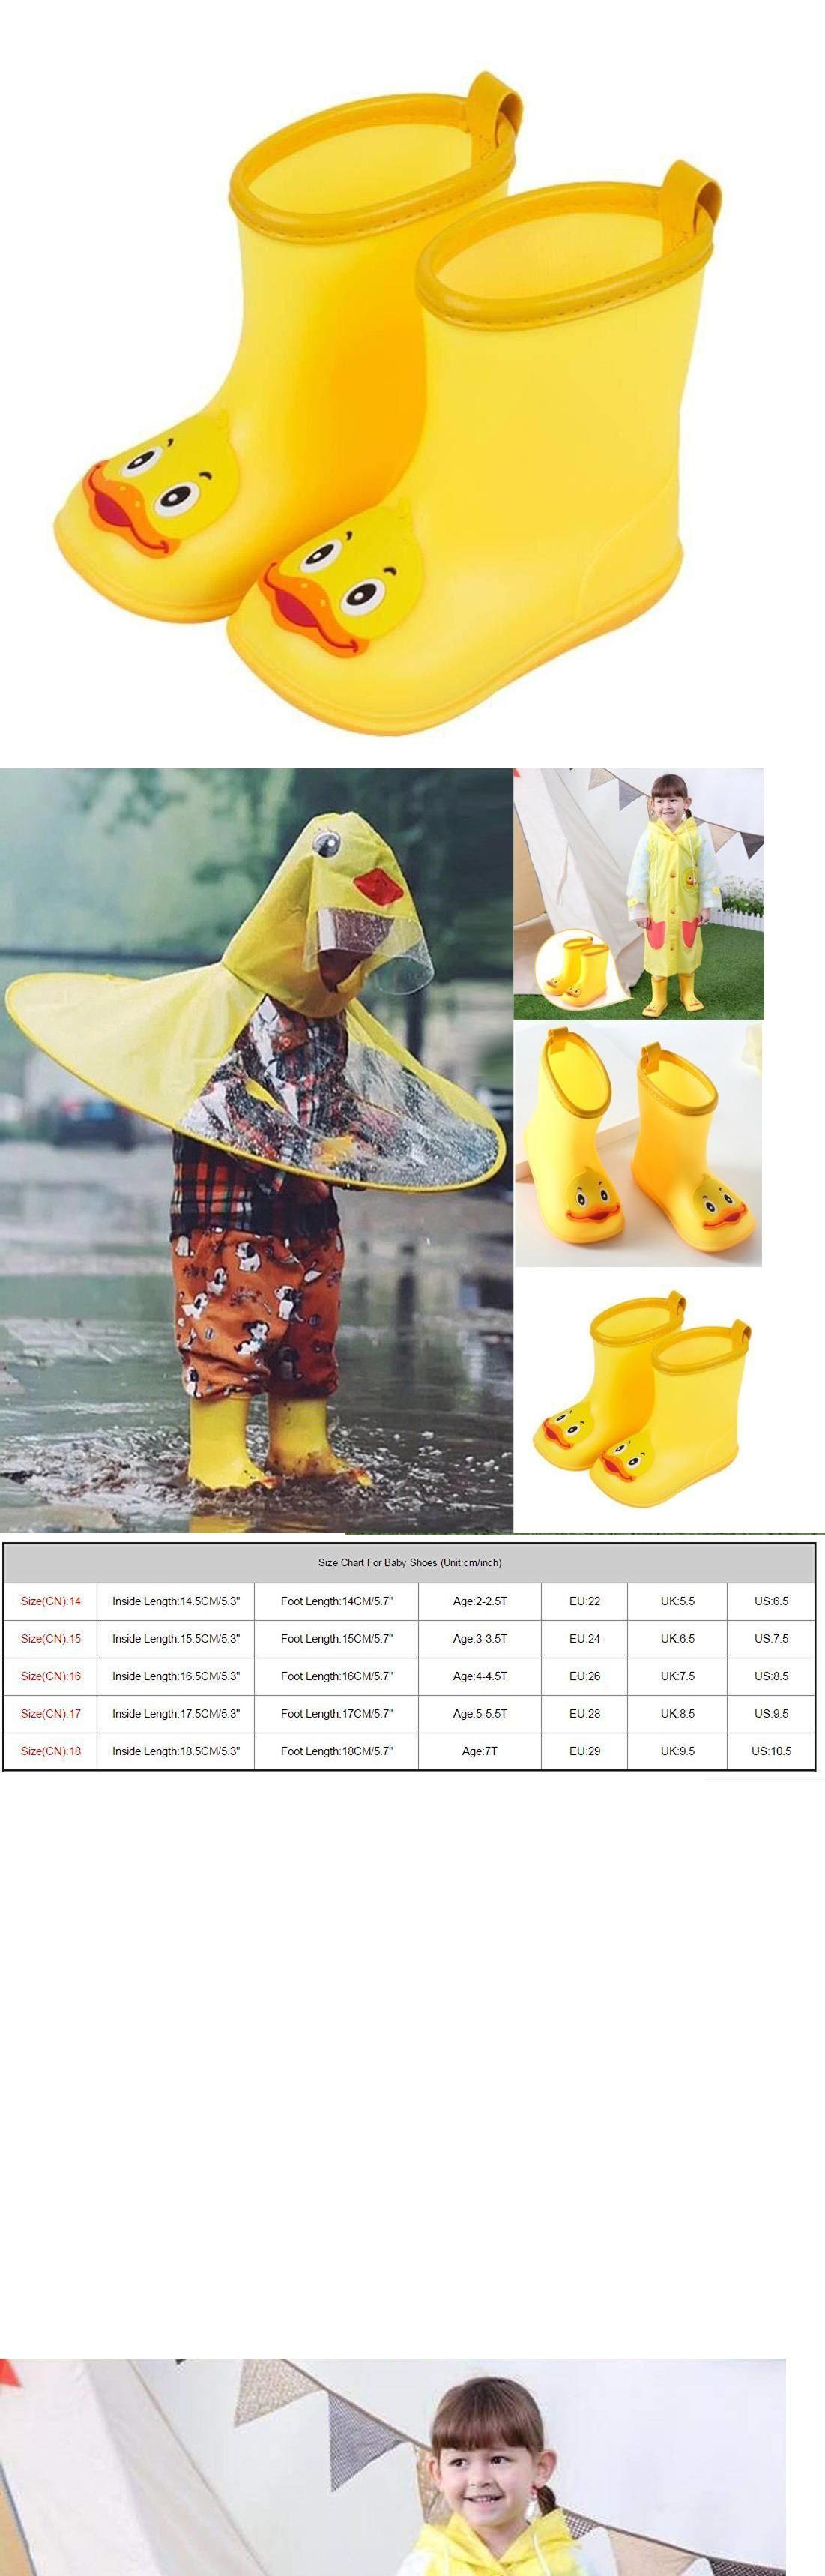 ea5fe7b68b36e Outsta Infant Kids Rain Shoes,Children Cartoon Duck Rubber ...